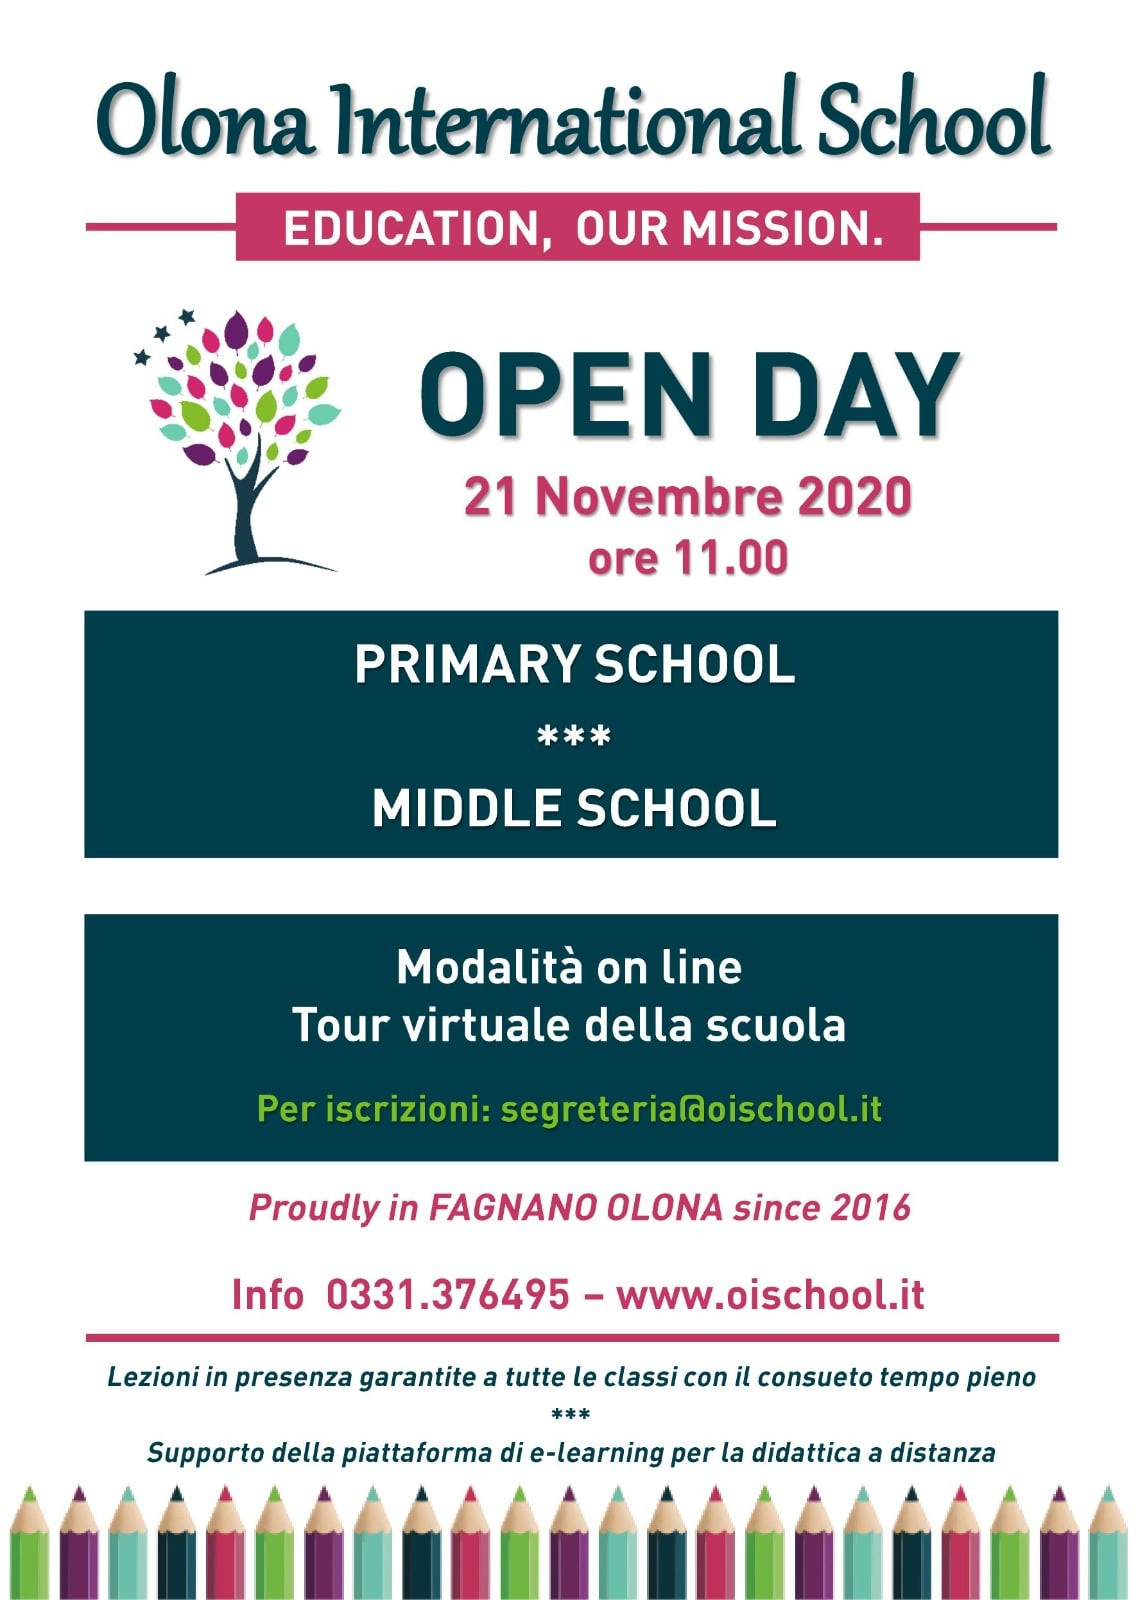 21 Novembre 2020 Openday Online Olona International School!!!!